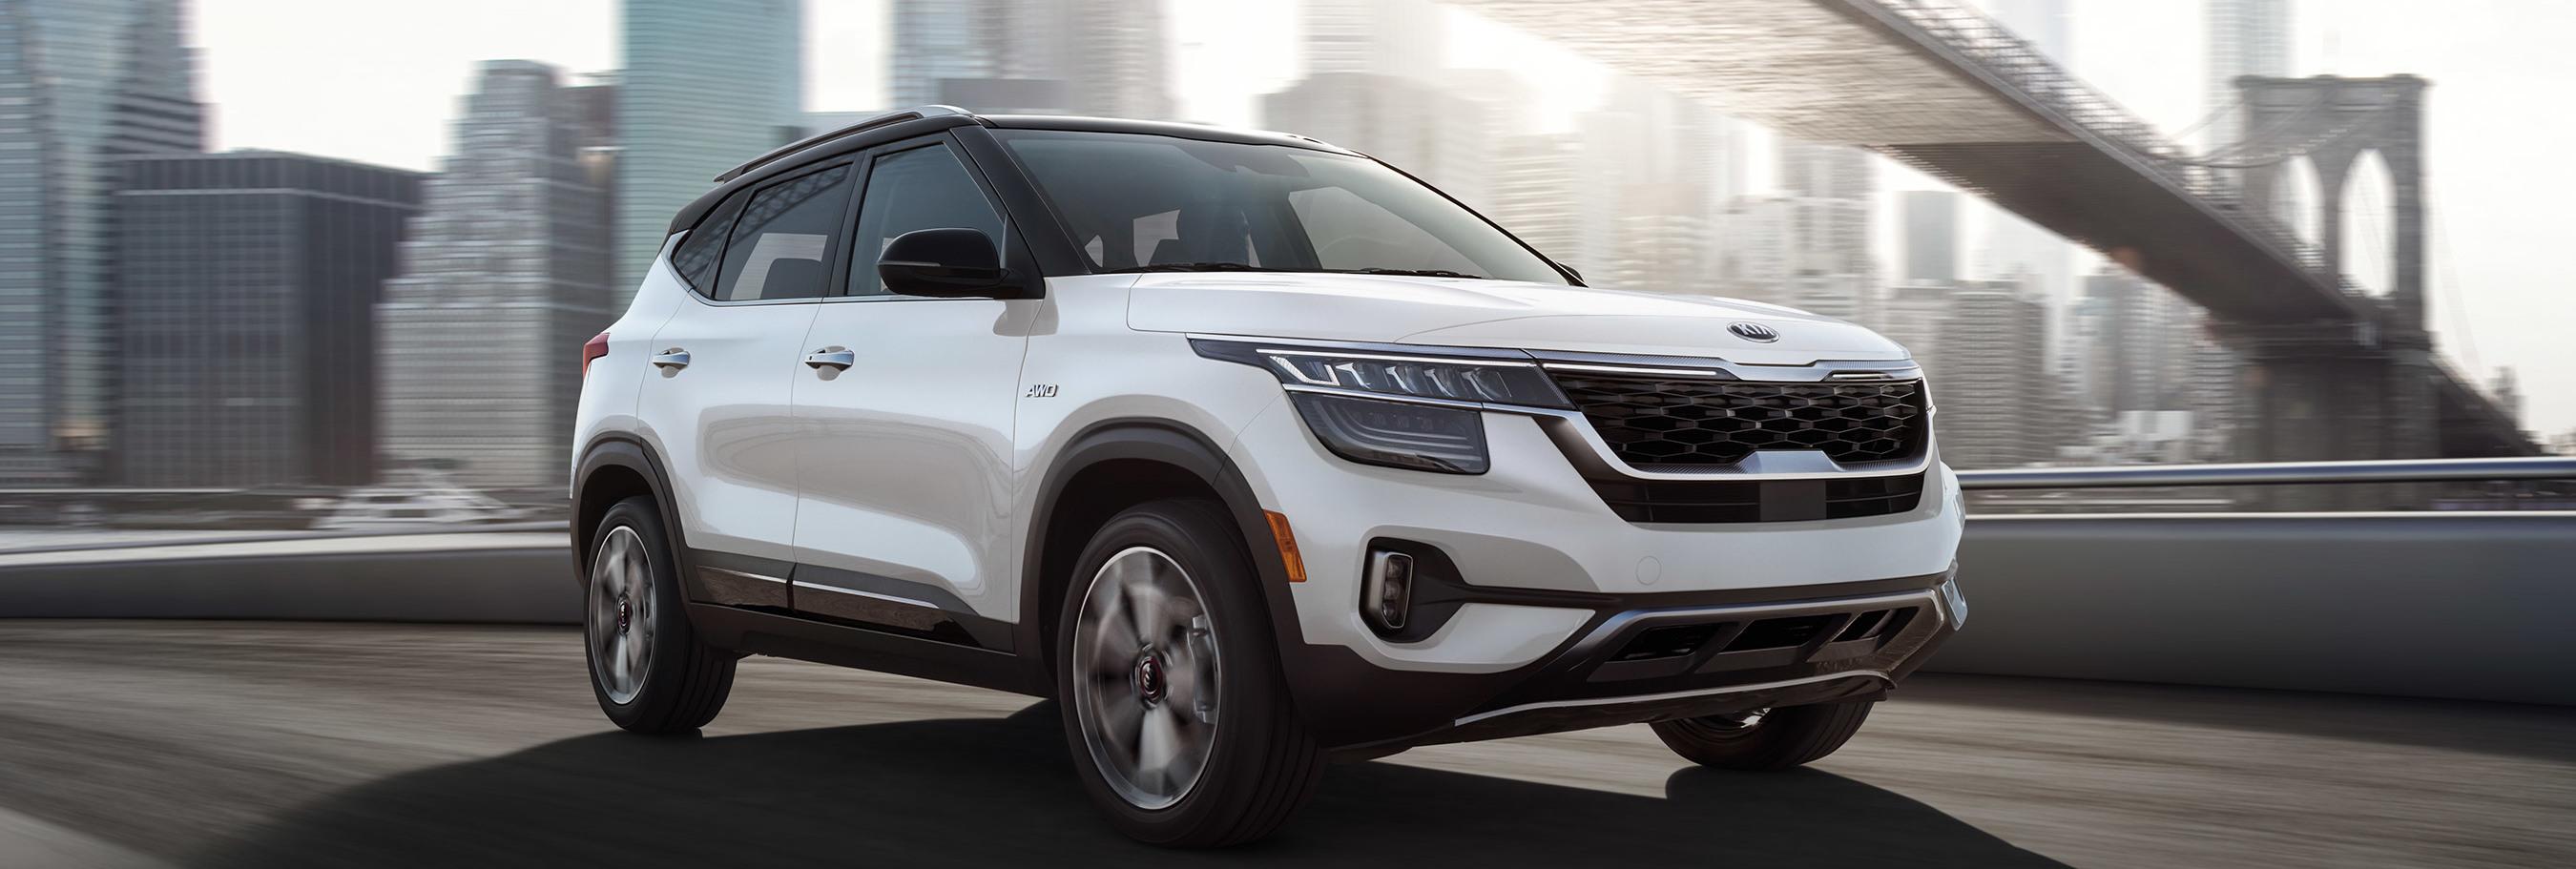 2021 Kia Seltos for Sale near Boerne, TX